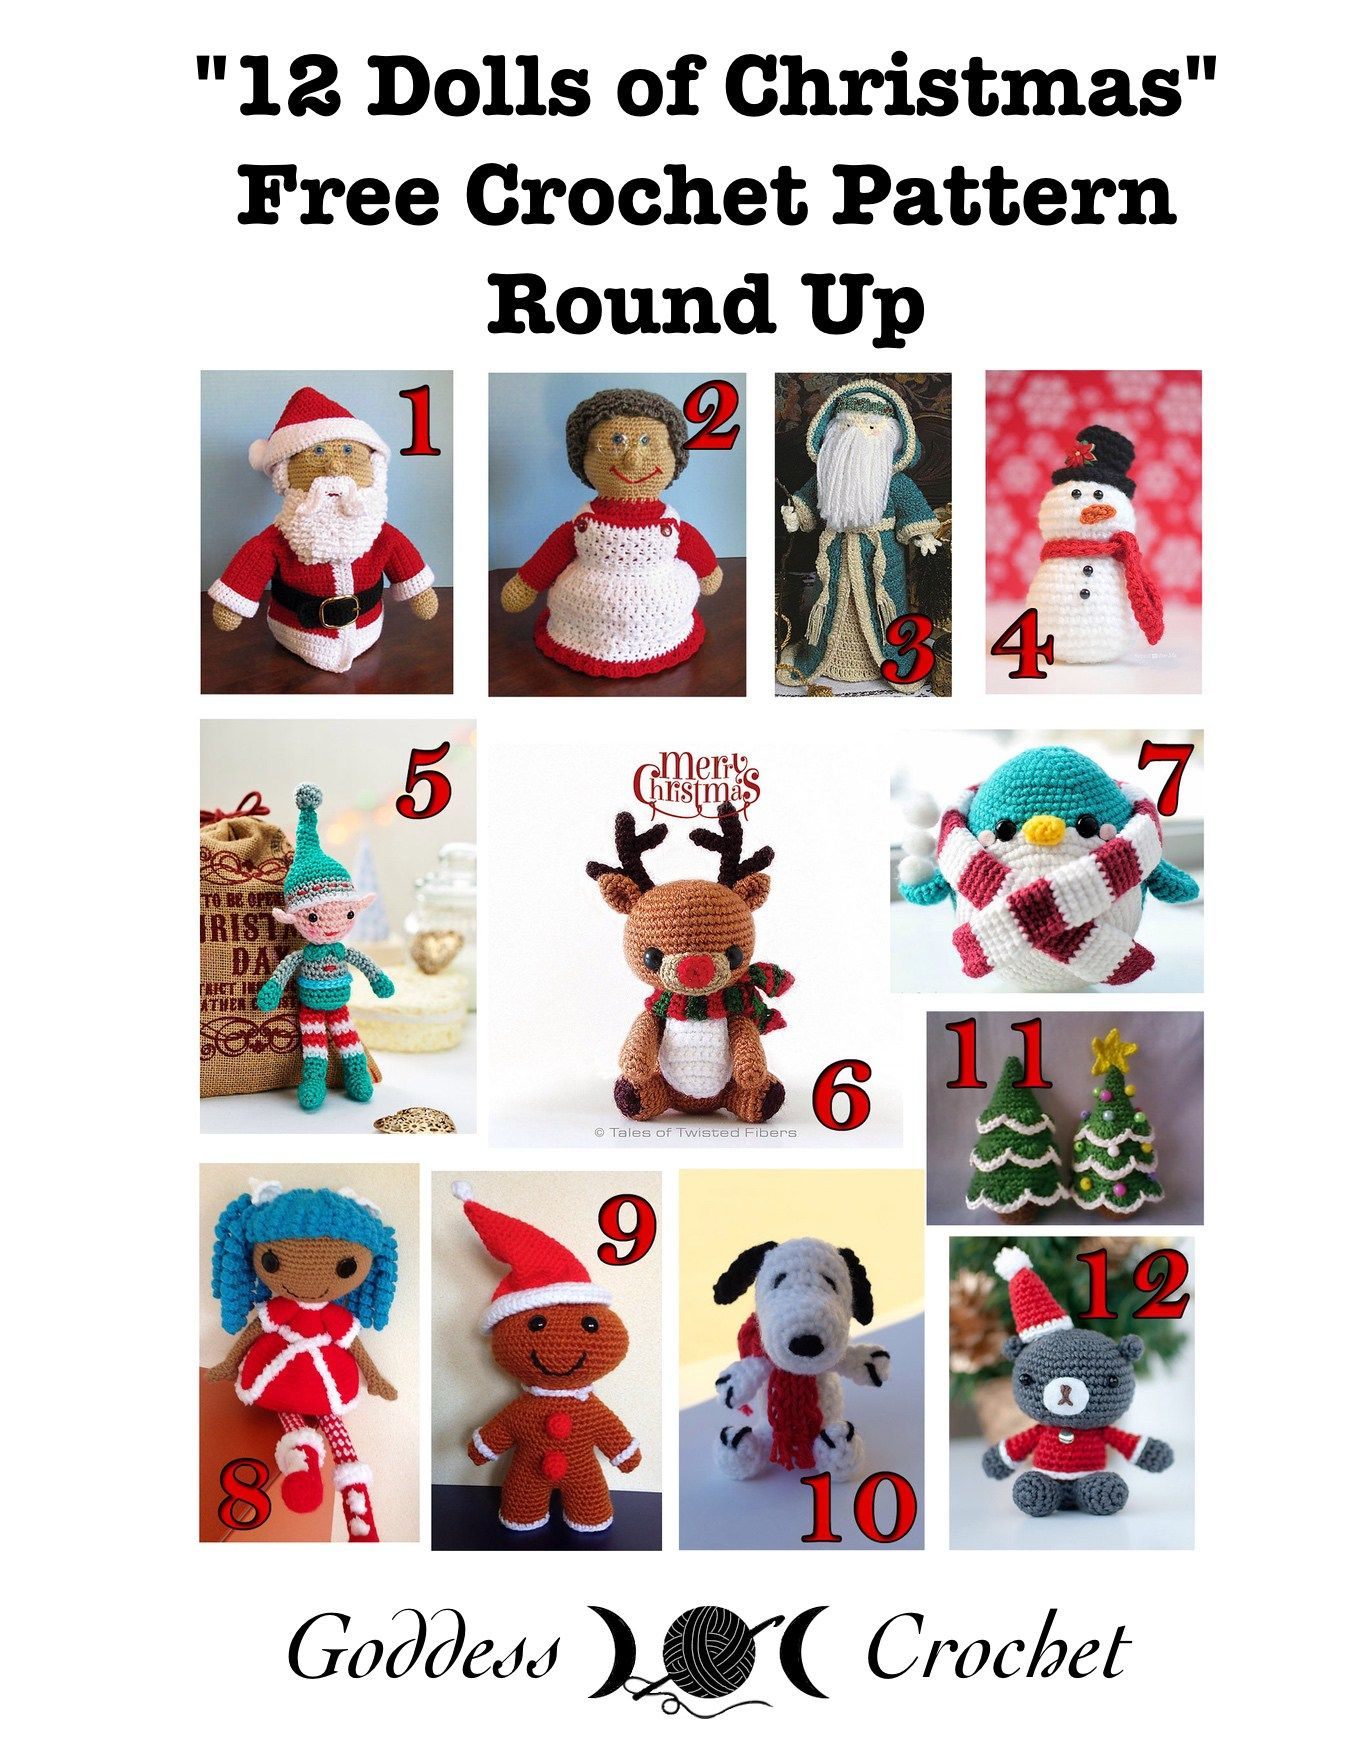 12 Dolls of Christmas - Free Crochet Pattern Round Up